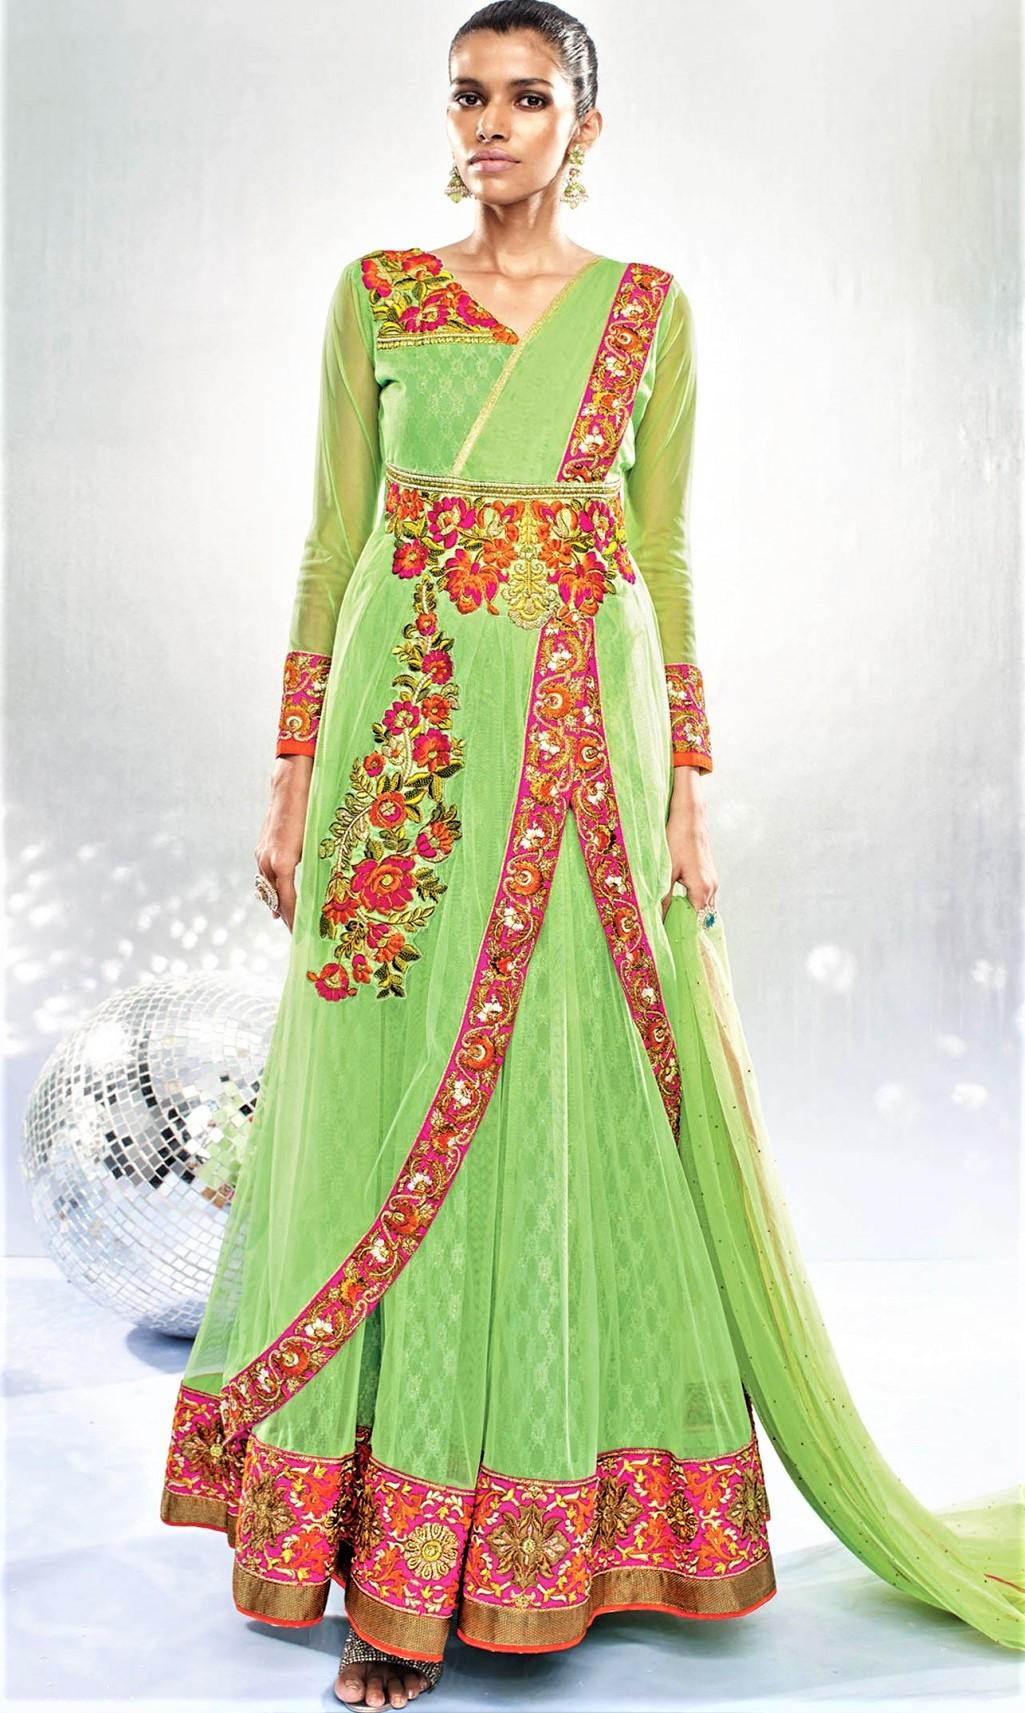 Top 5 Best Green Mehndi Dresses 2018